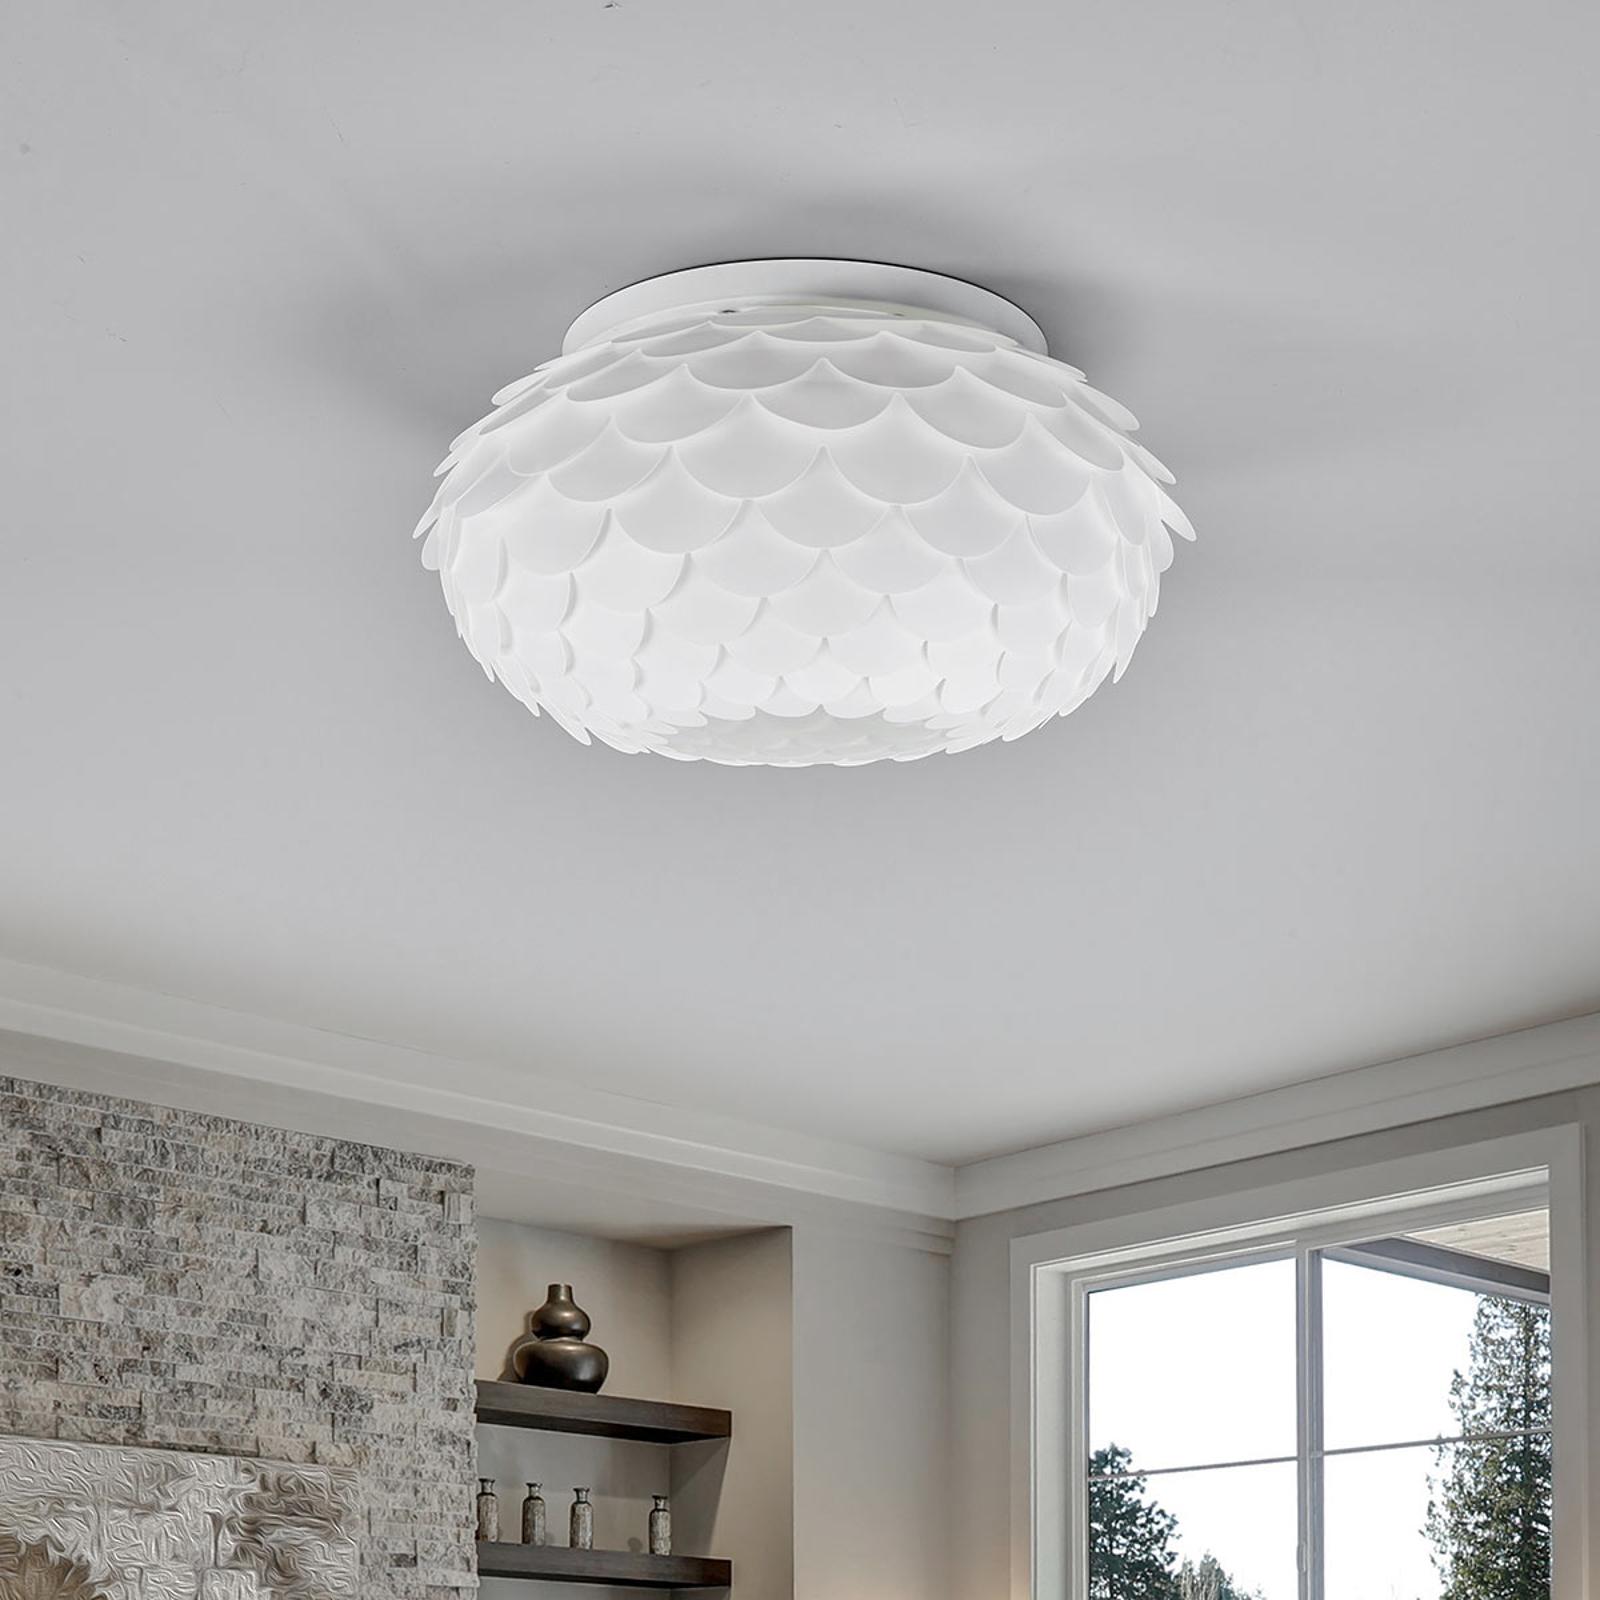 Taklampen Marees i hvitt, rund